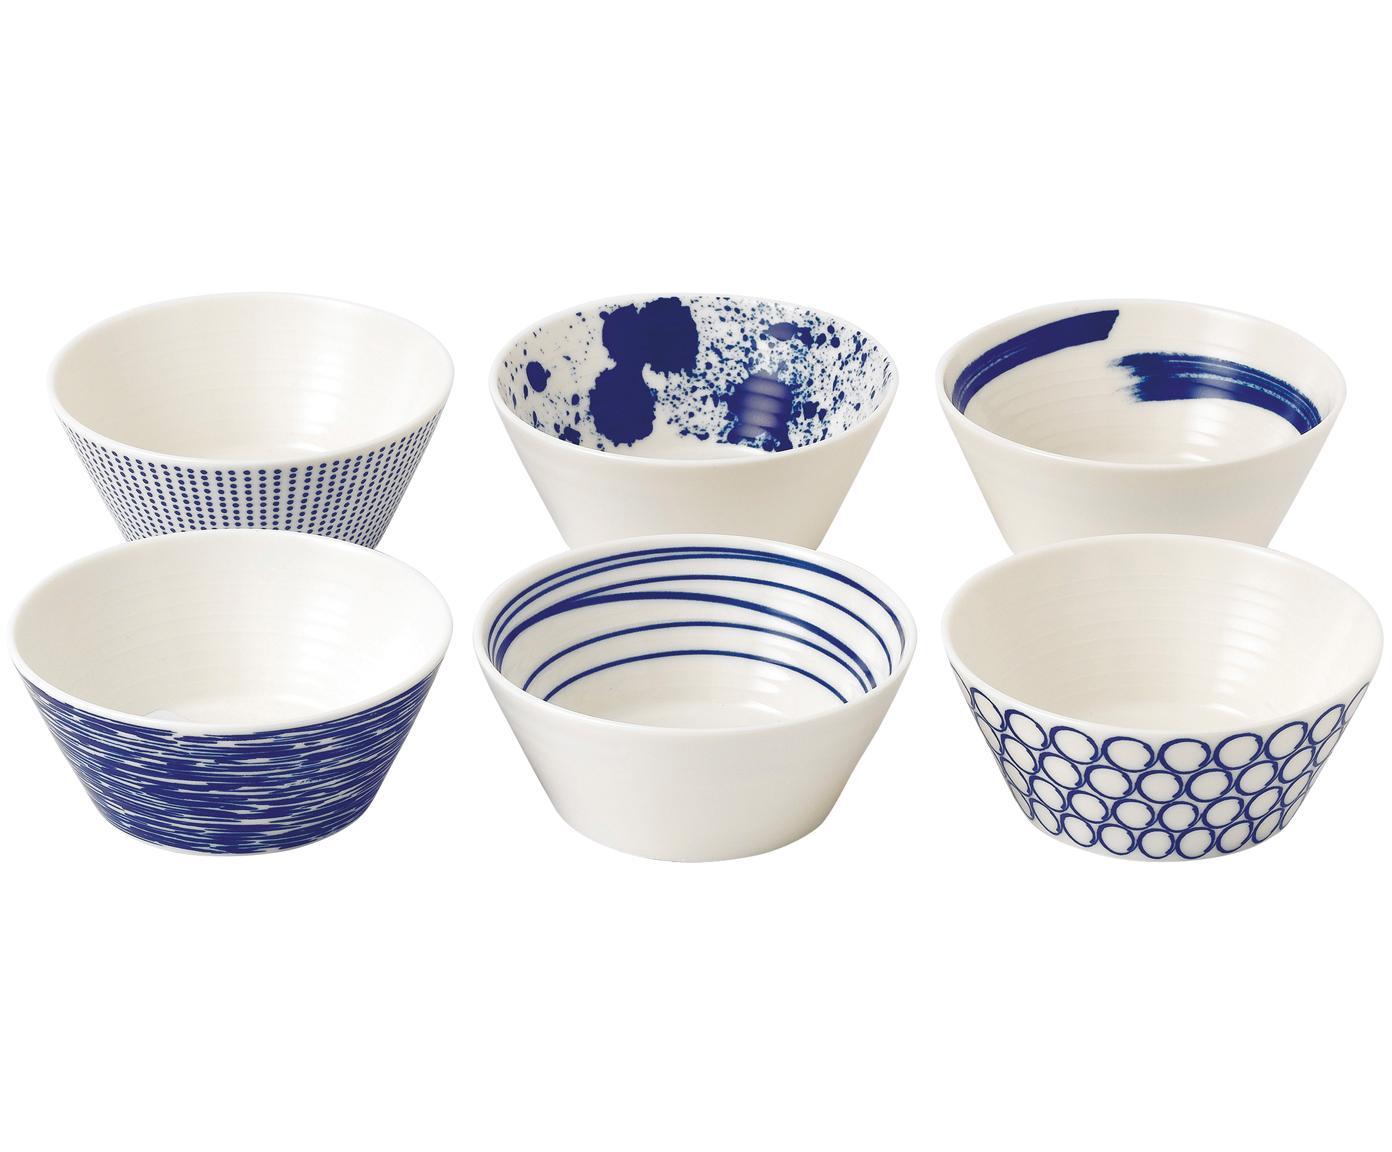 Set de cuencos de porcelana Pacific, 6pzas., Porcelana, Blanco, azul, Ø 11 cm